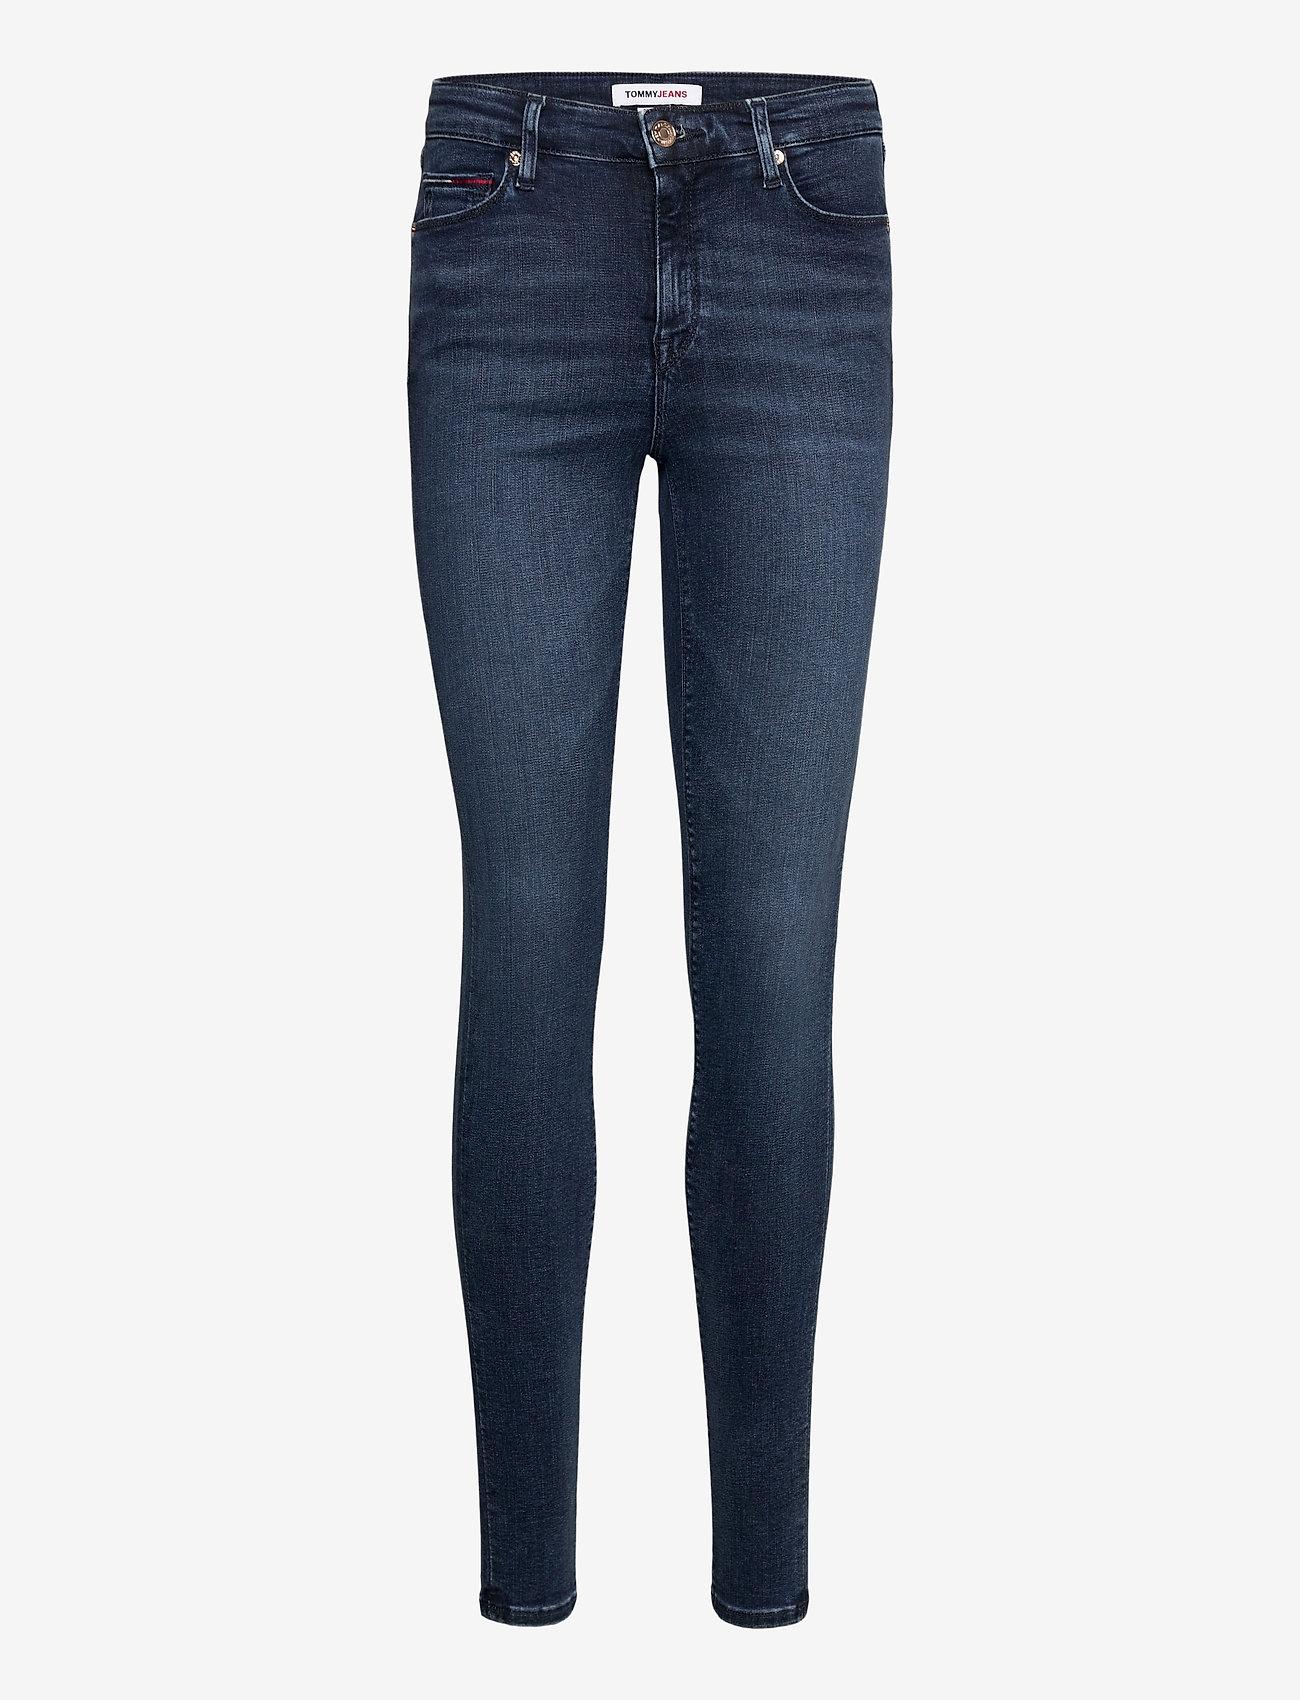 Tommy Jeans - NORA MR SKNY DYLDBS - straight jeans - dynamic lora dark blue str - 0